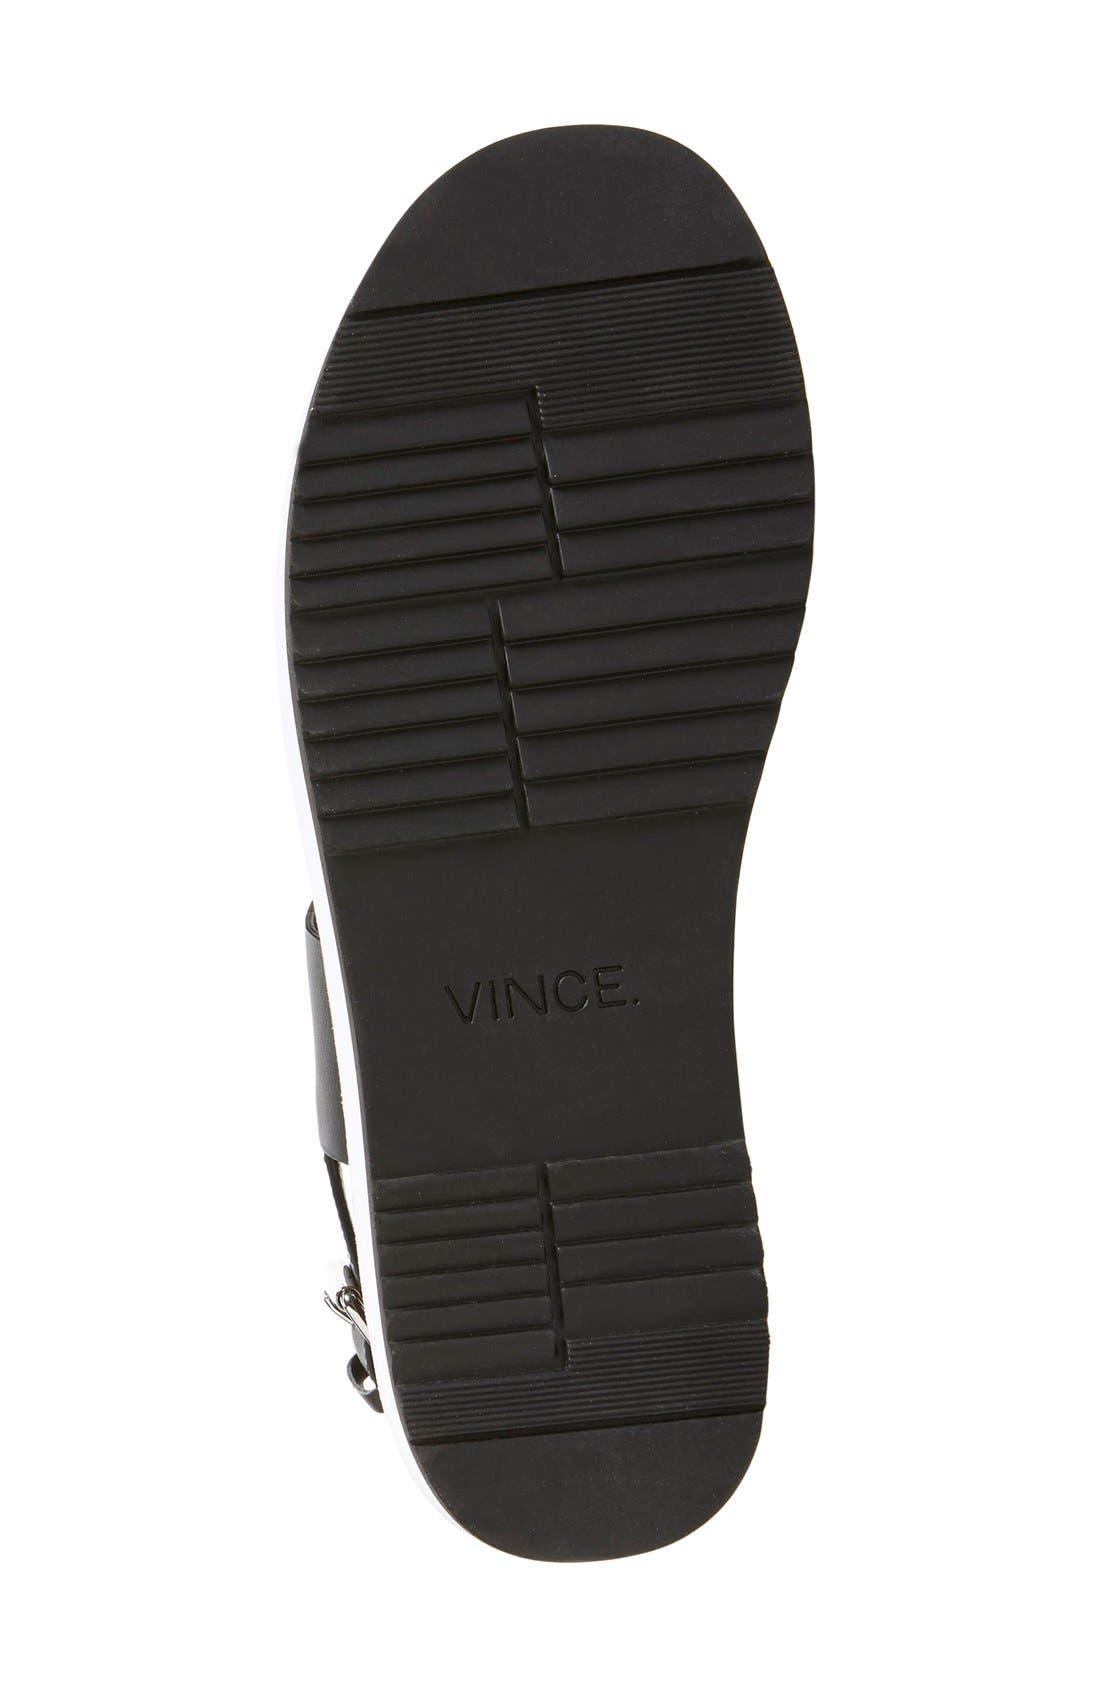 VINCE, 'Mana' Flatform Sandal, Alternate thumbnail 3, color, 001